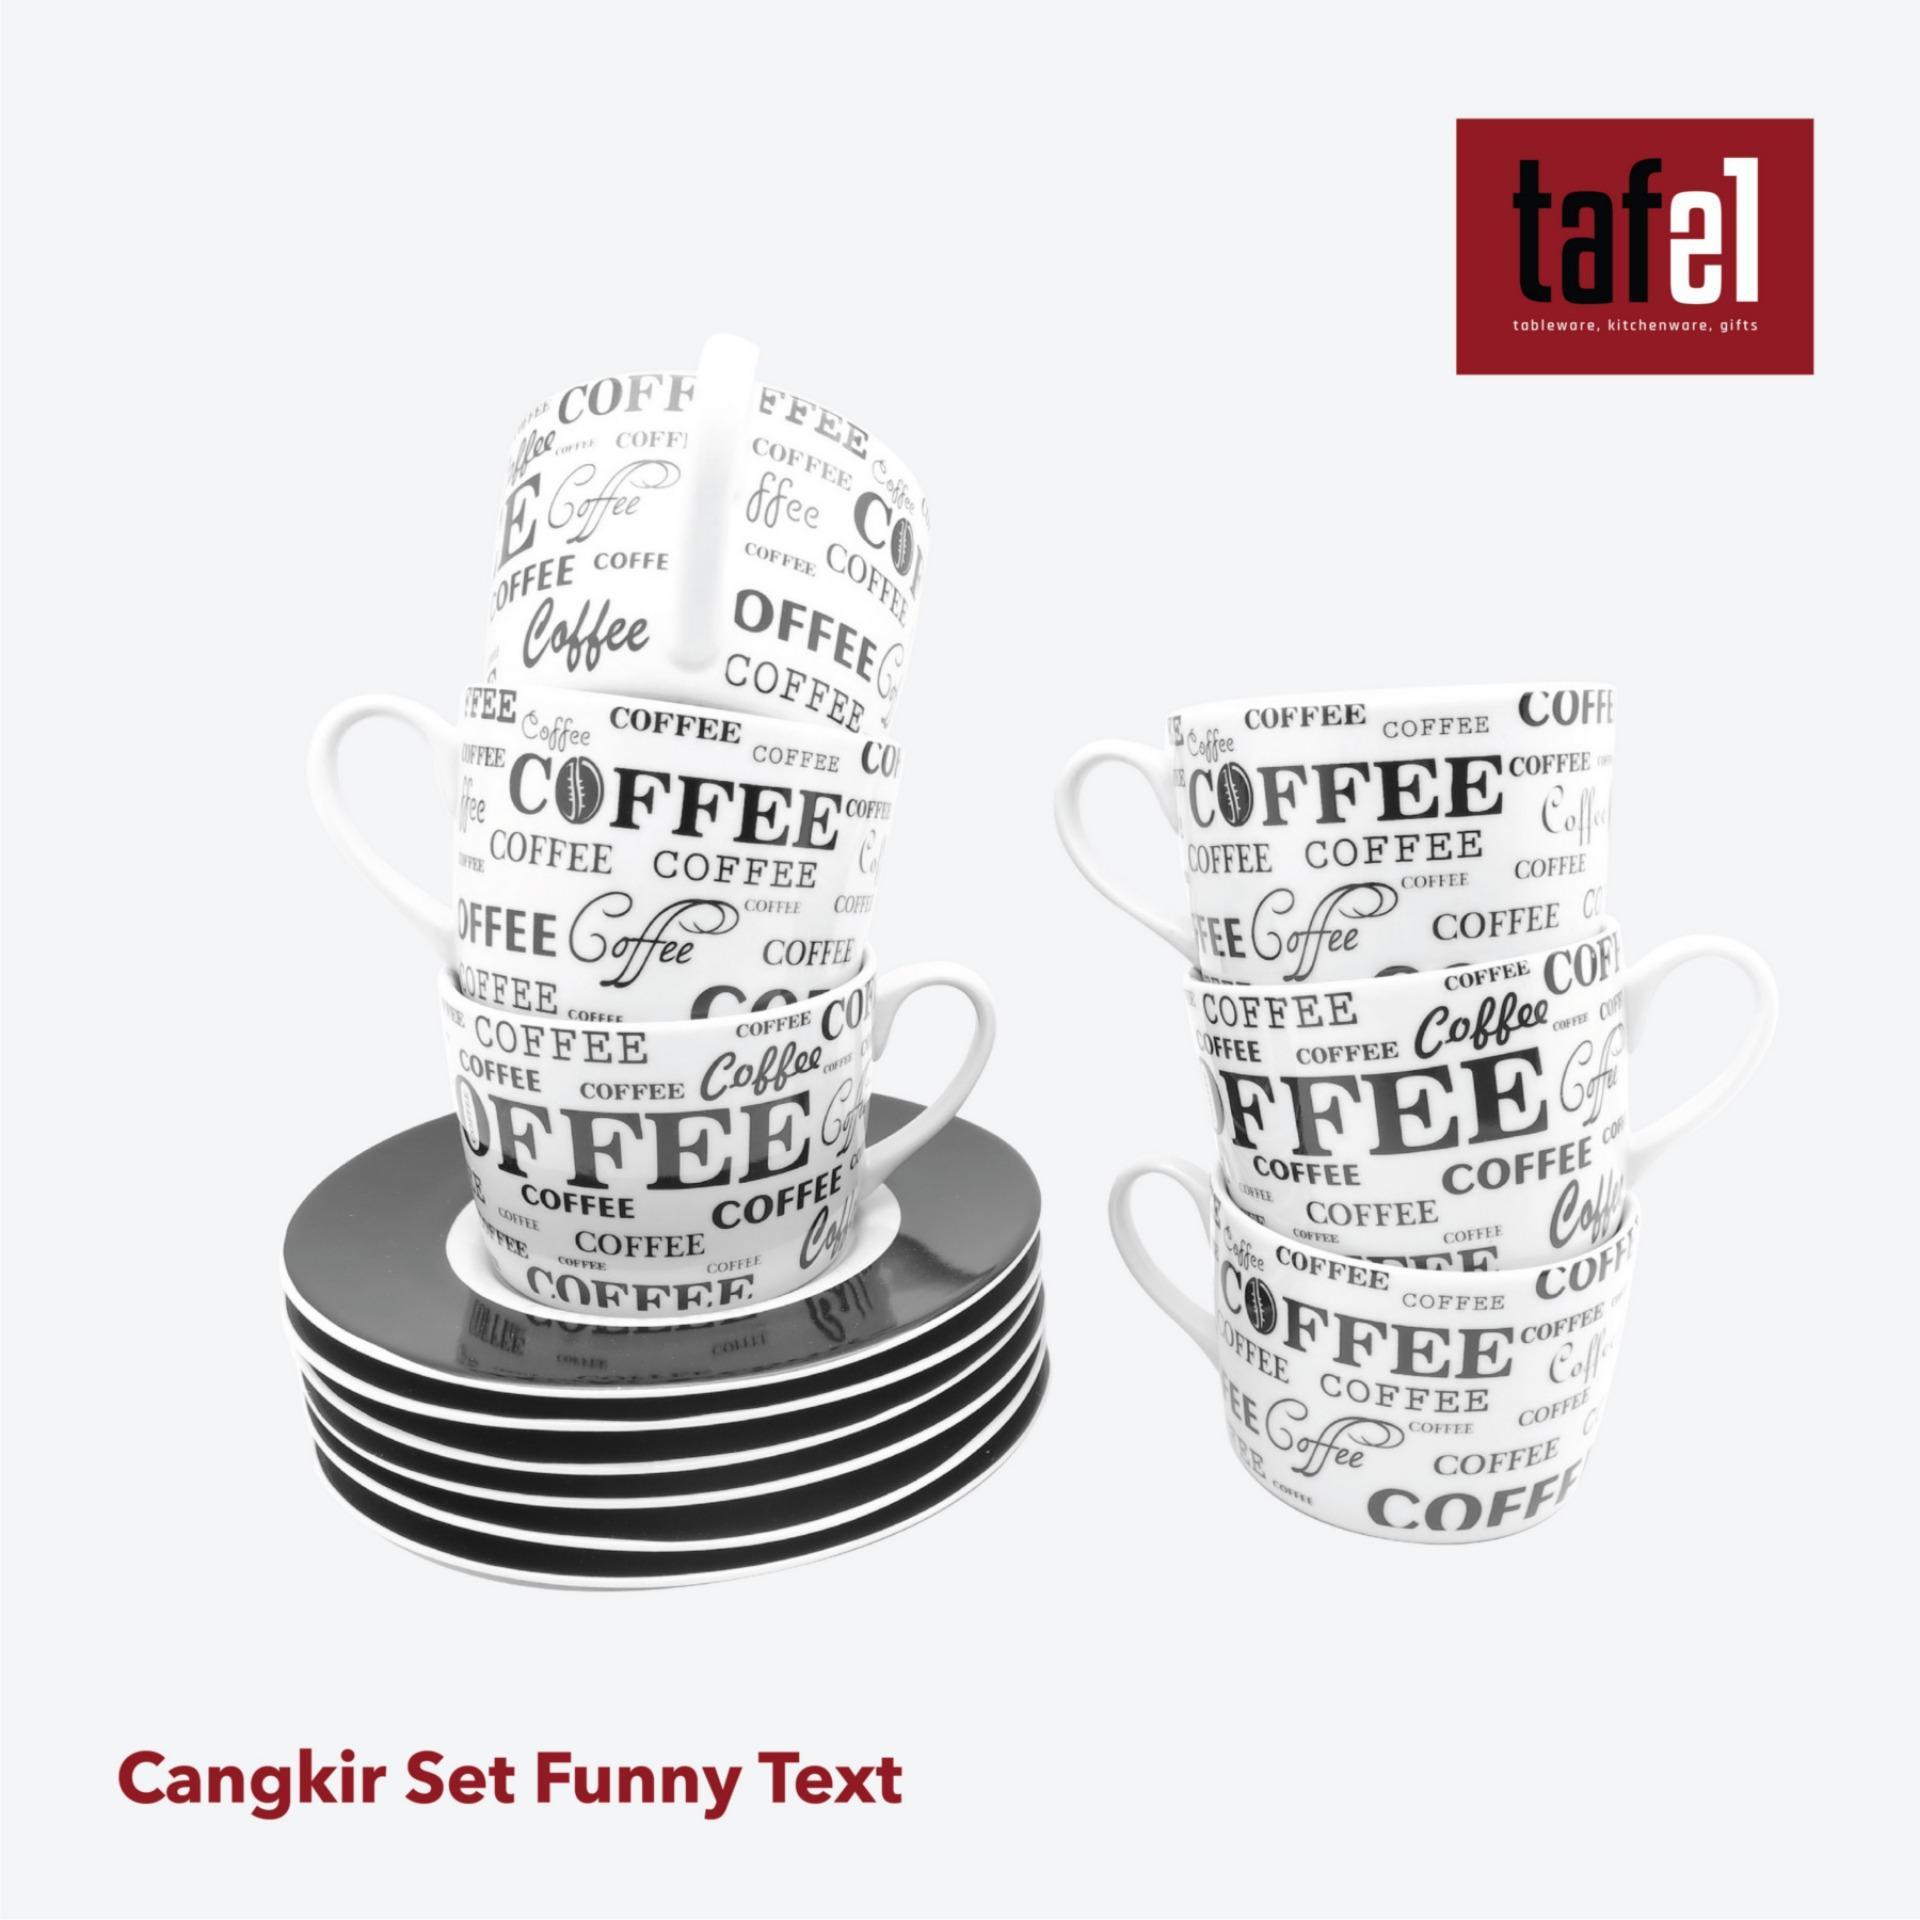 Tafel21 Cangkir Set Funny Text 12pcs / Cangkir Teh / Cangkir Kopi